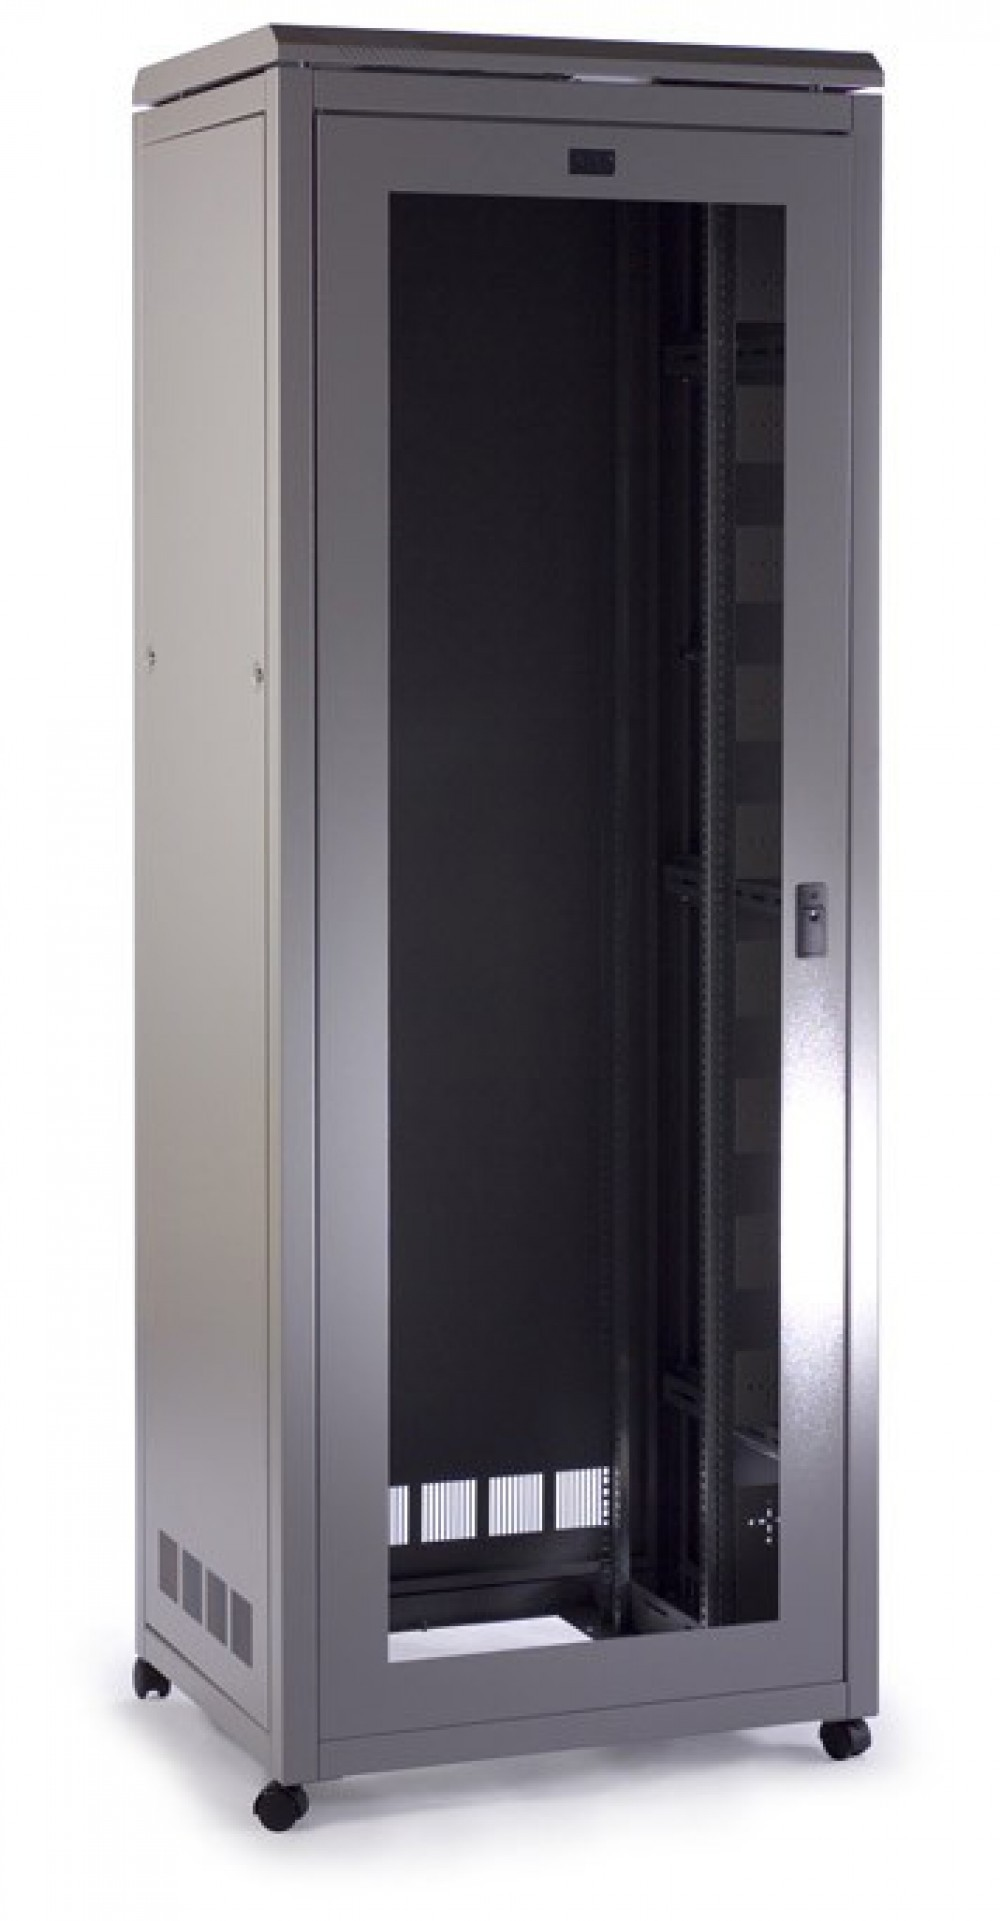 Prism Free Standing Cabinet 42U (2070x800x600)